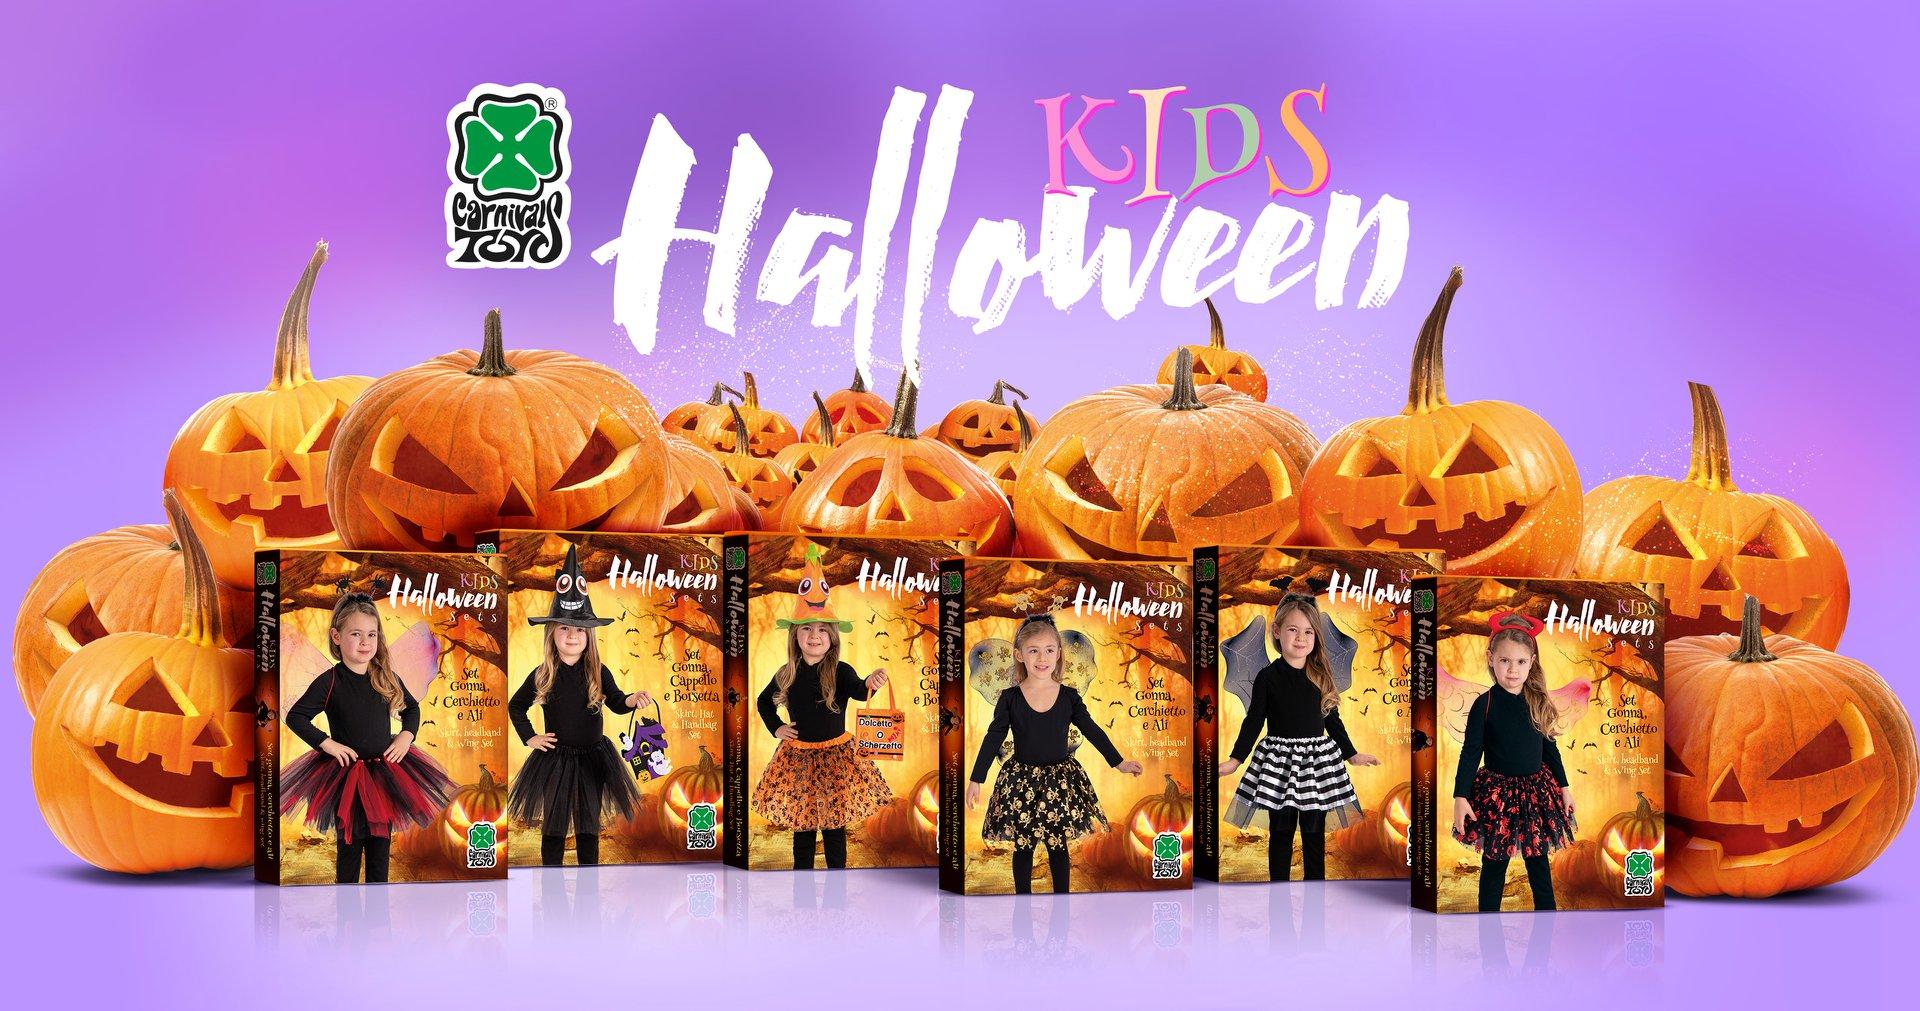 Carnival Toys - Halloween Kids 2019